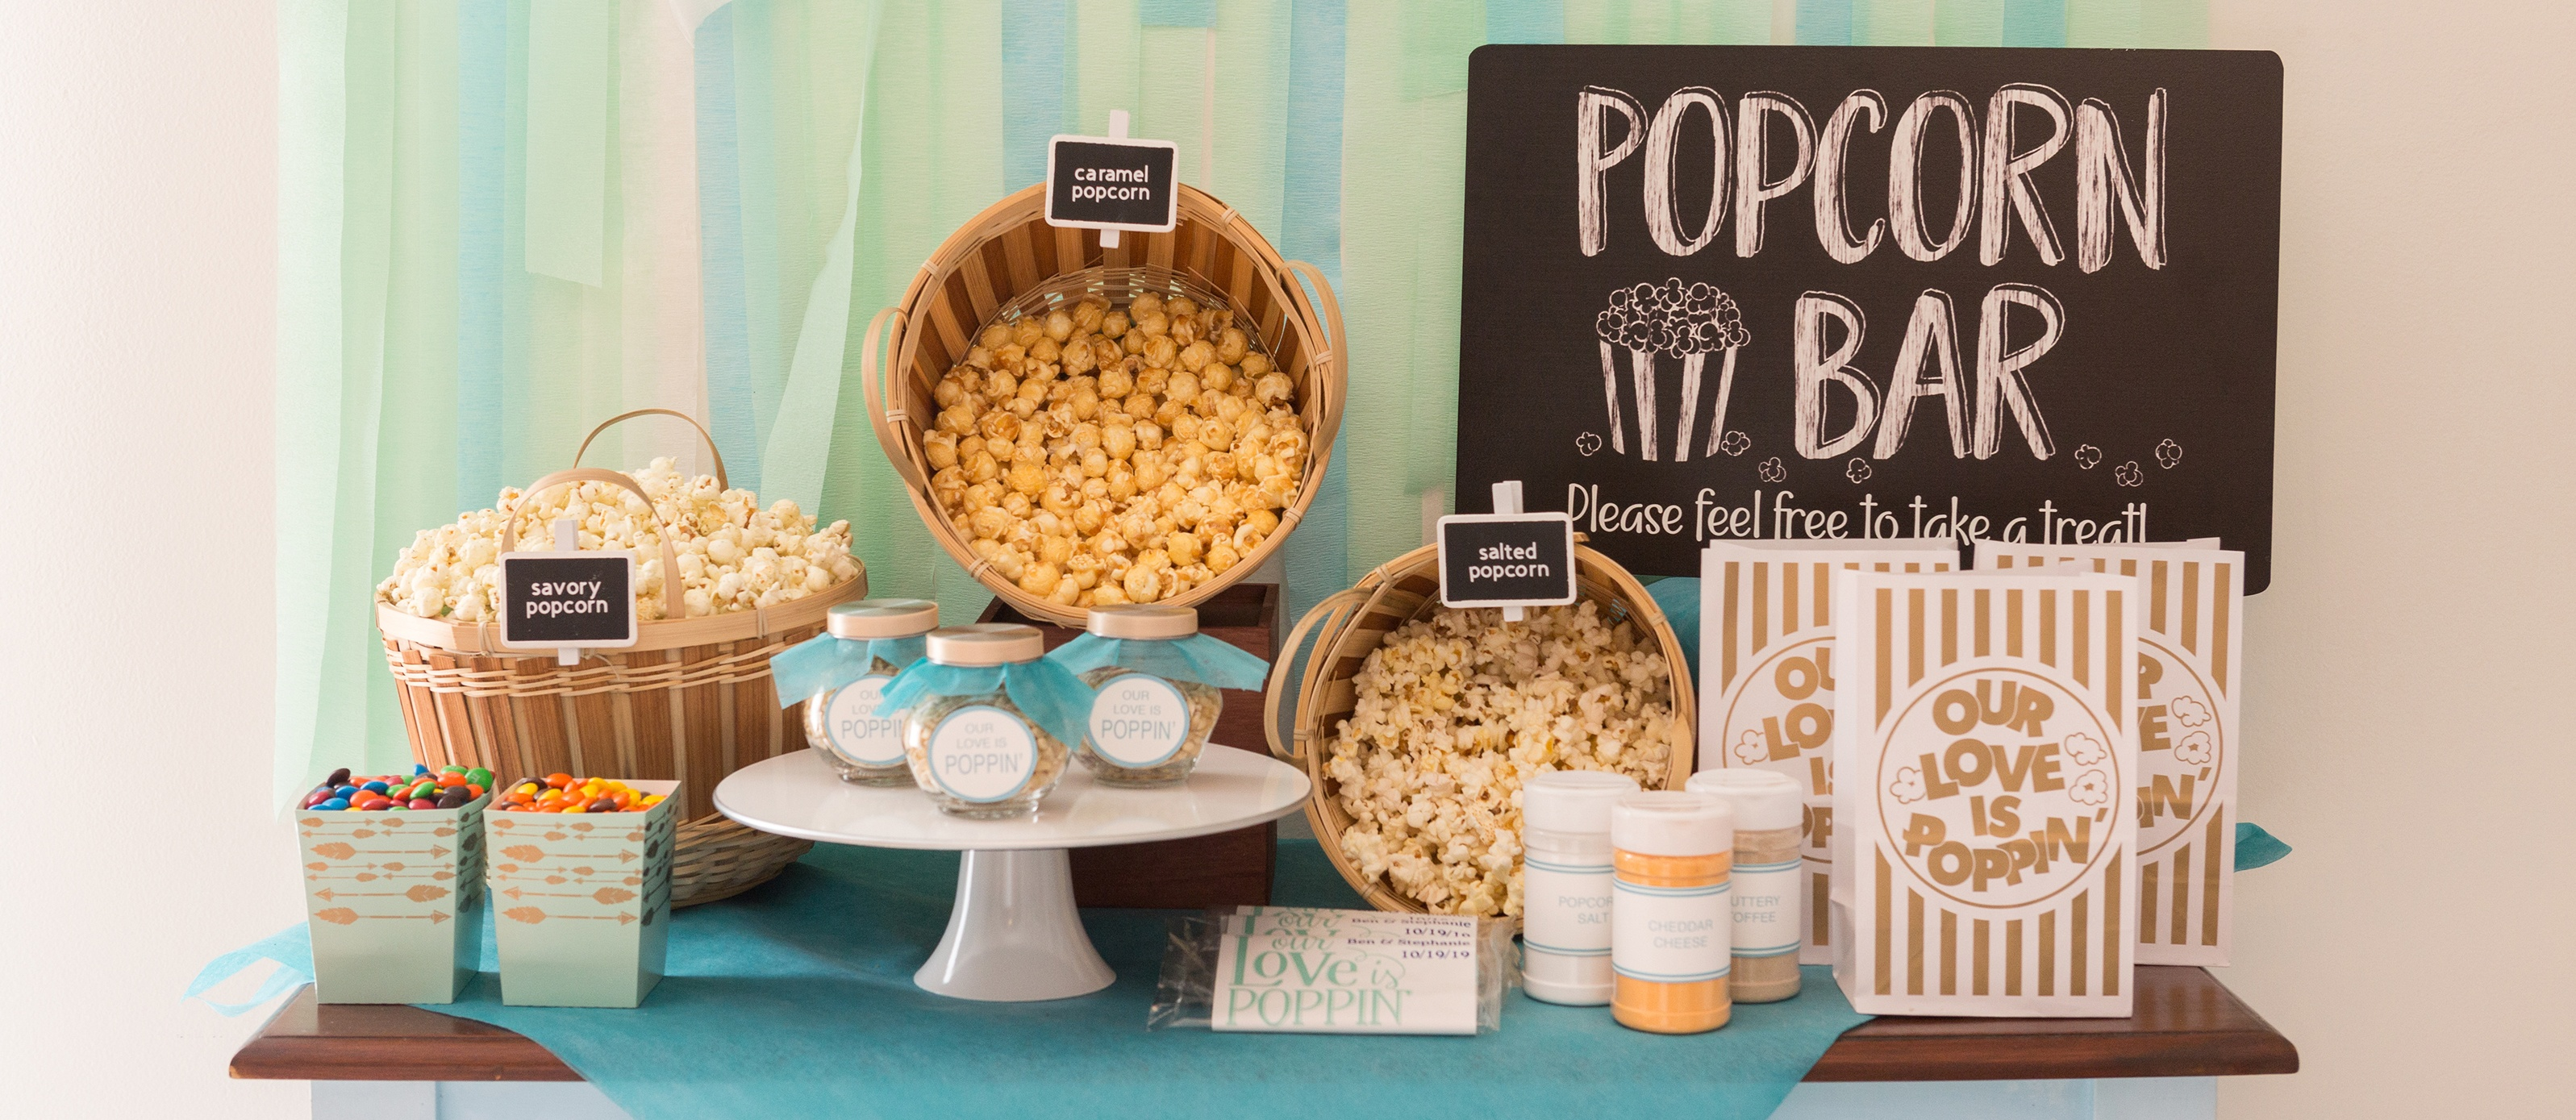 How To Create A Wedding Popcorn Bar | Fun365 - Free Printable Popcorn Bar Labels